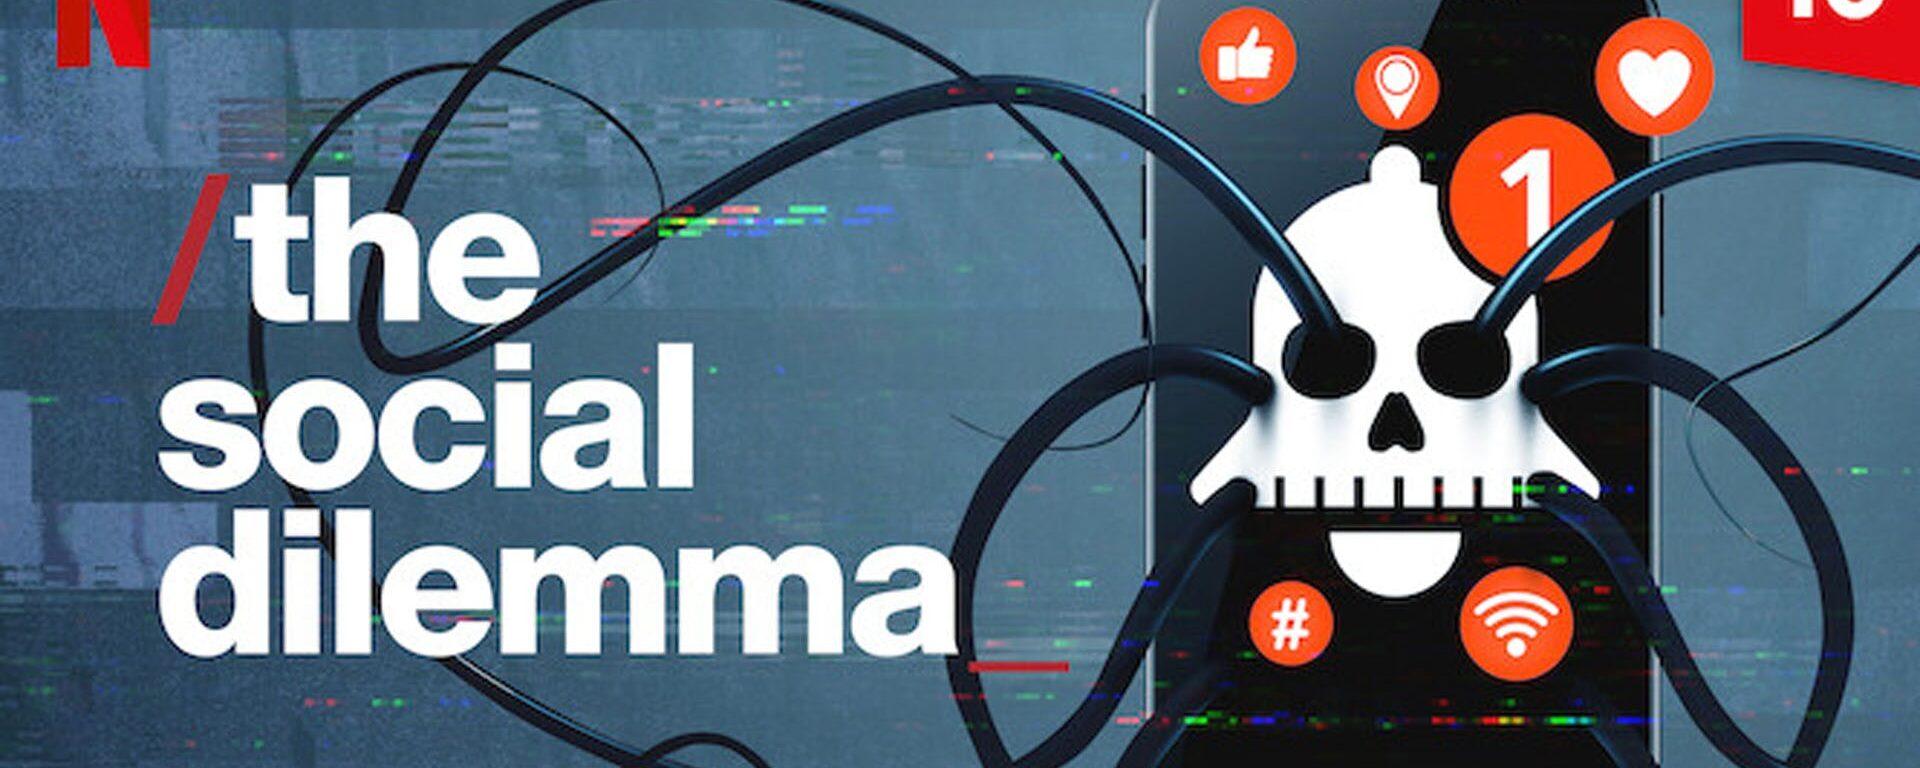 G-COM radio Ep. 86: Lyfeblood Born Out of The Social Dilemma